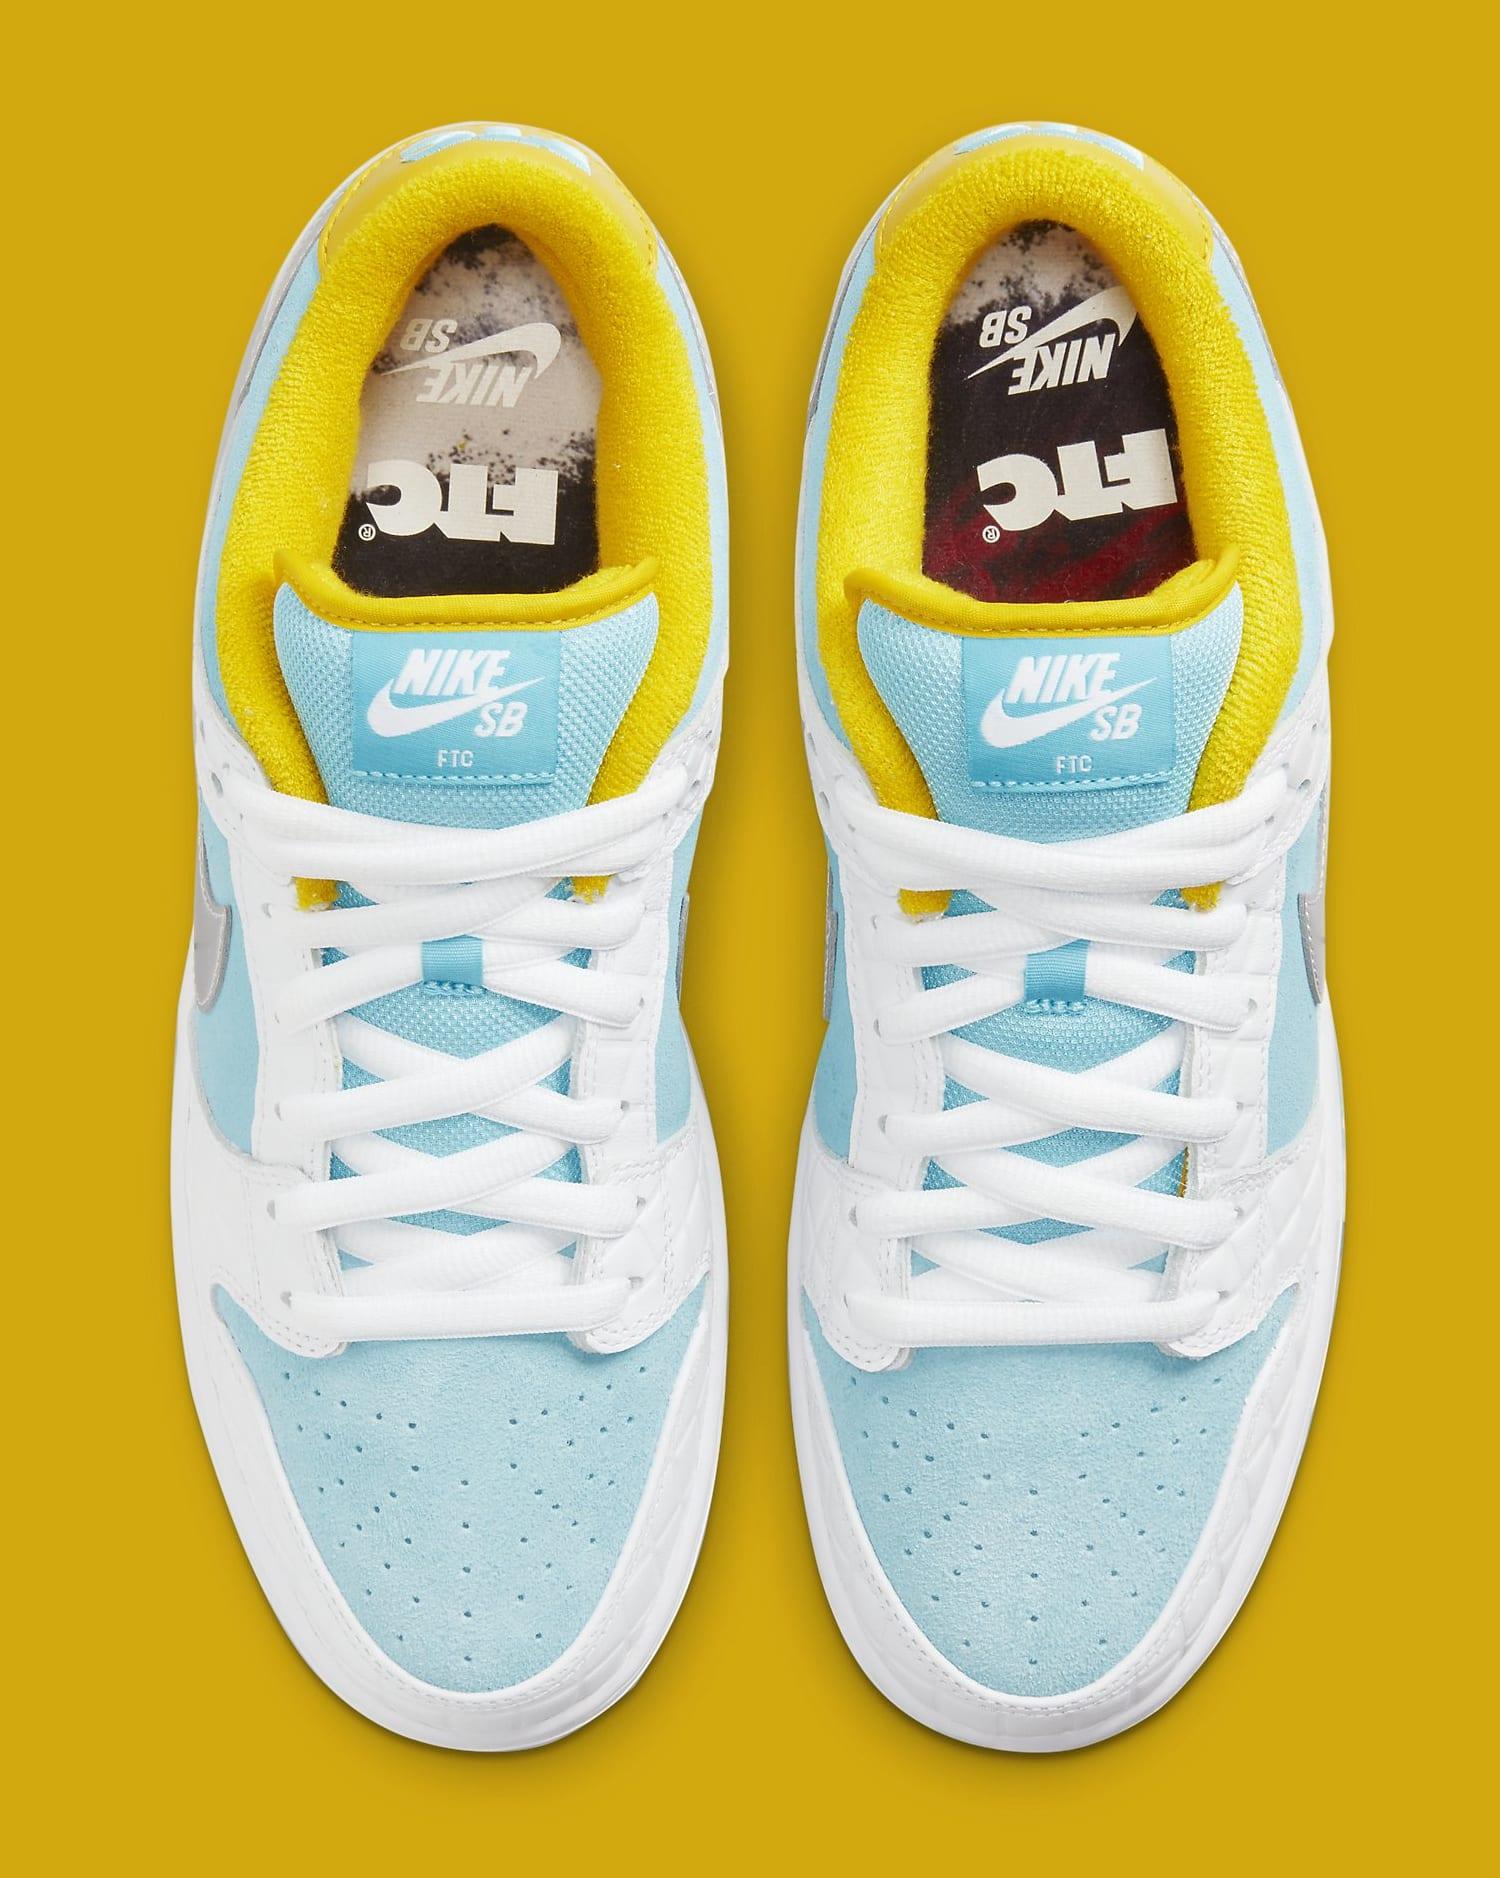 FTC x Nike SB Dunk Low DH7687-400 Top